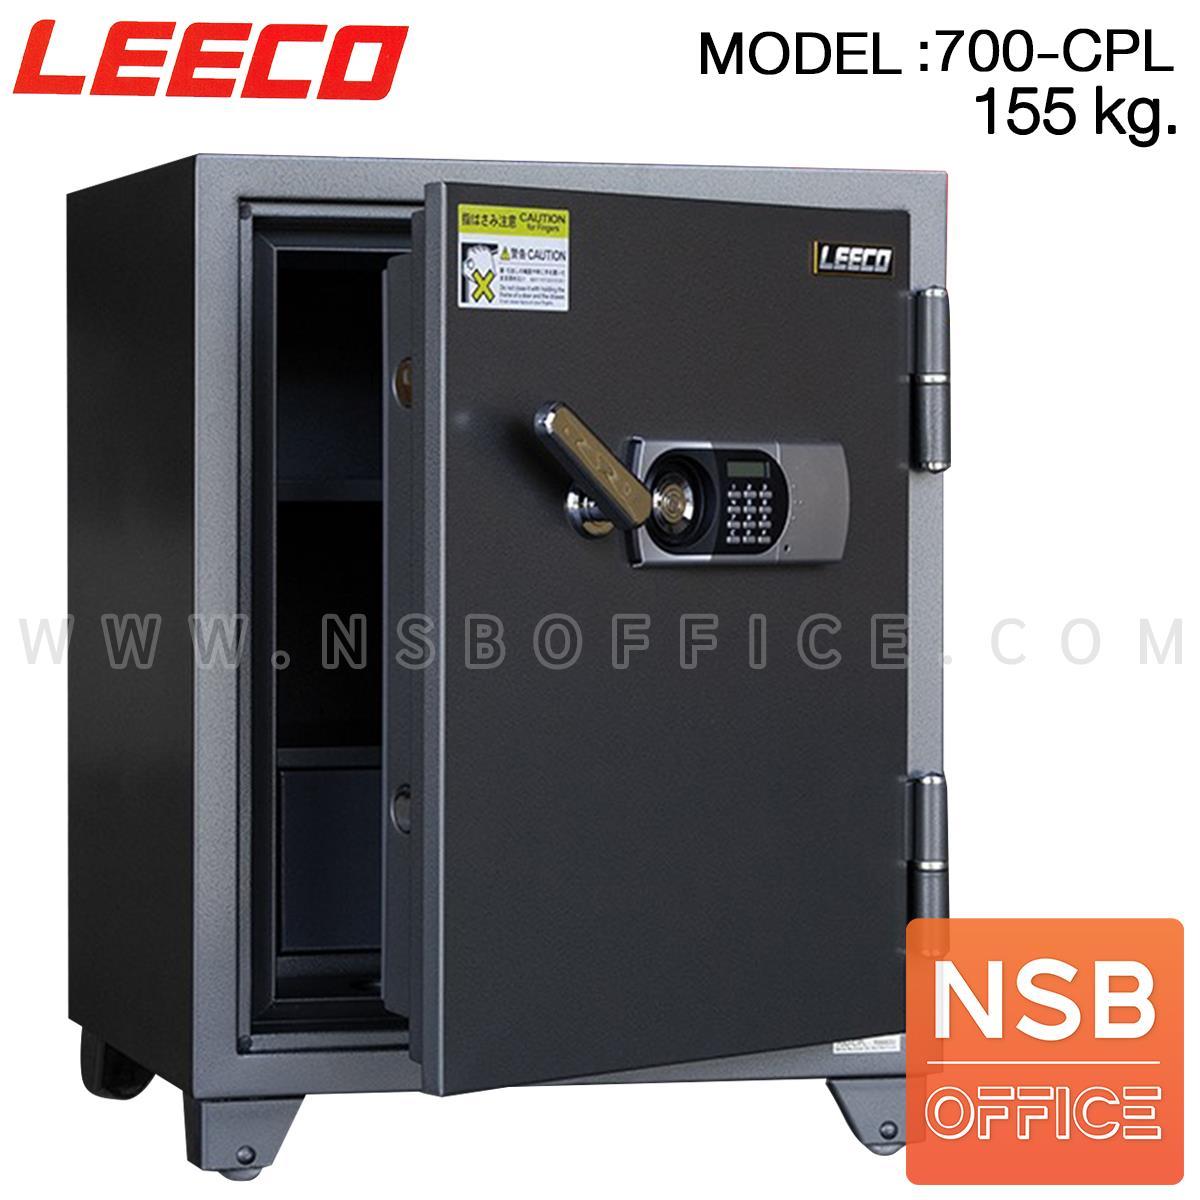 F02A062:ตู้เซฟดิจิตอล 155 กก. รุ่น 700-CPL   1 กุญแจ 1 รหัส